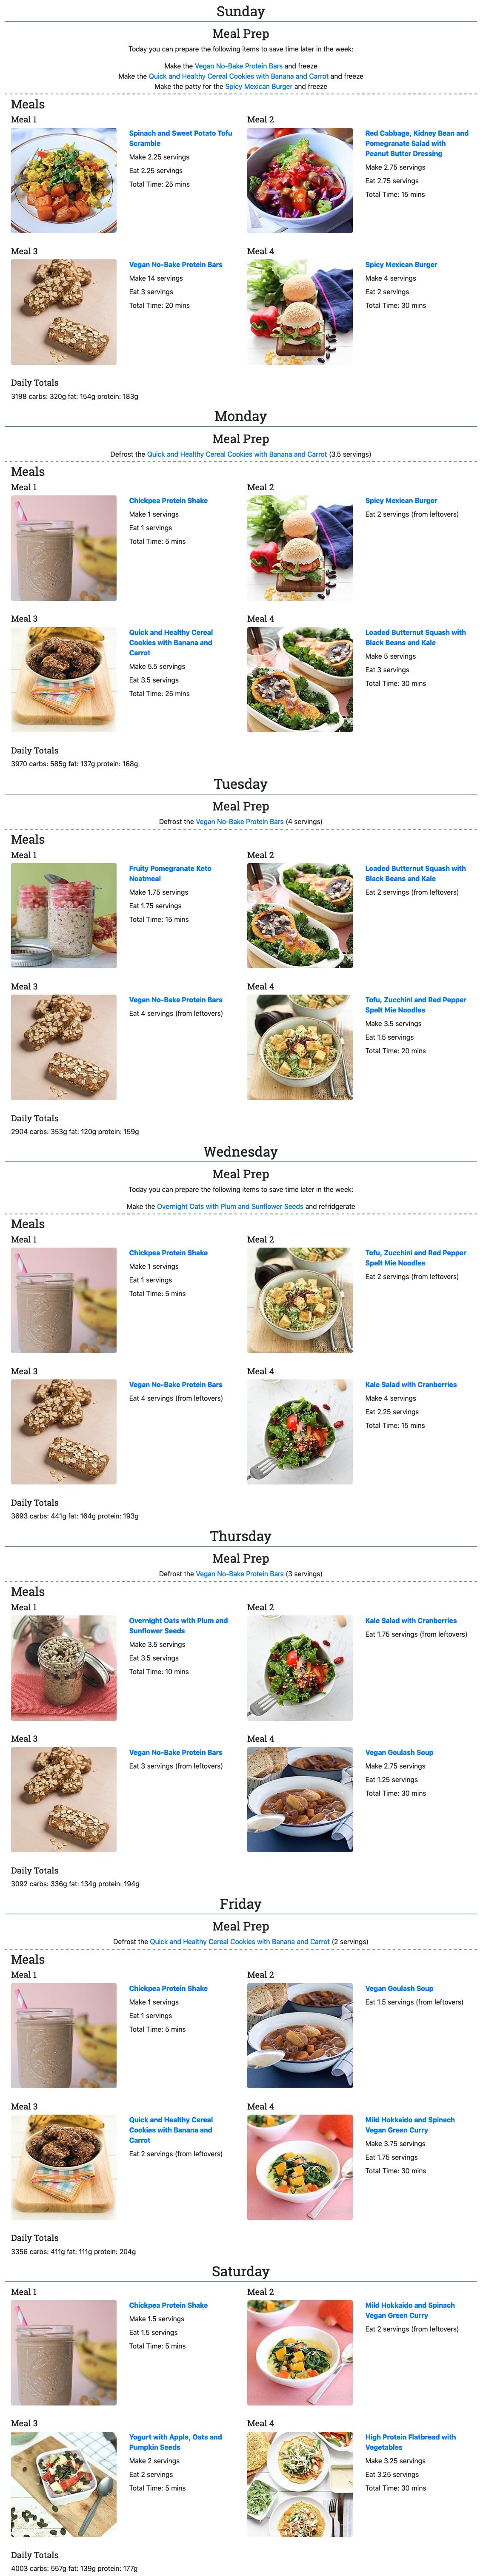 Vegan Bodybuilding Diet: The Ultimate Guide (2019) - Vegan.io